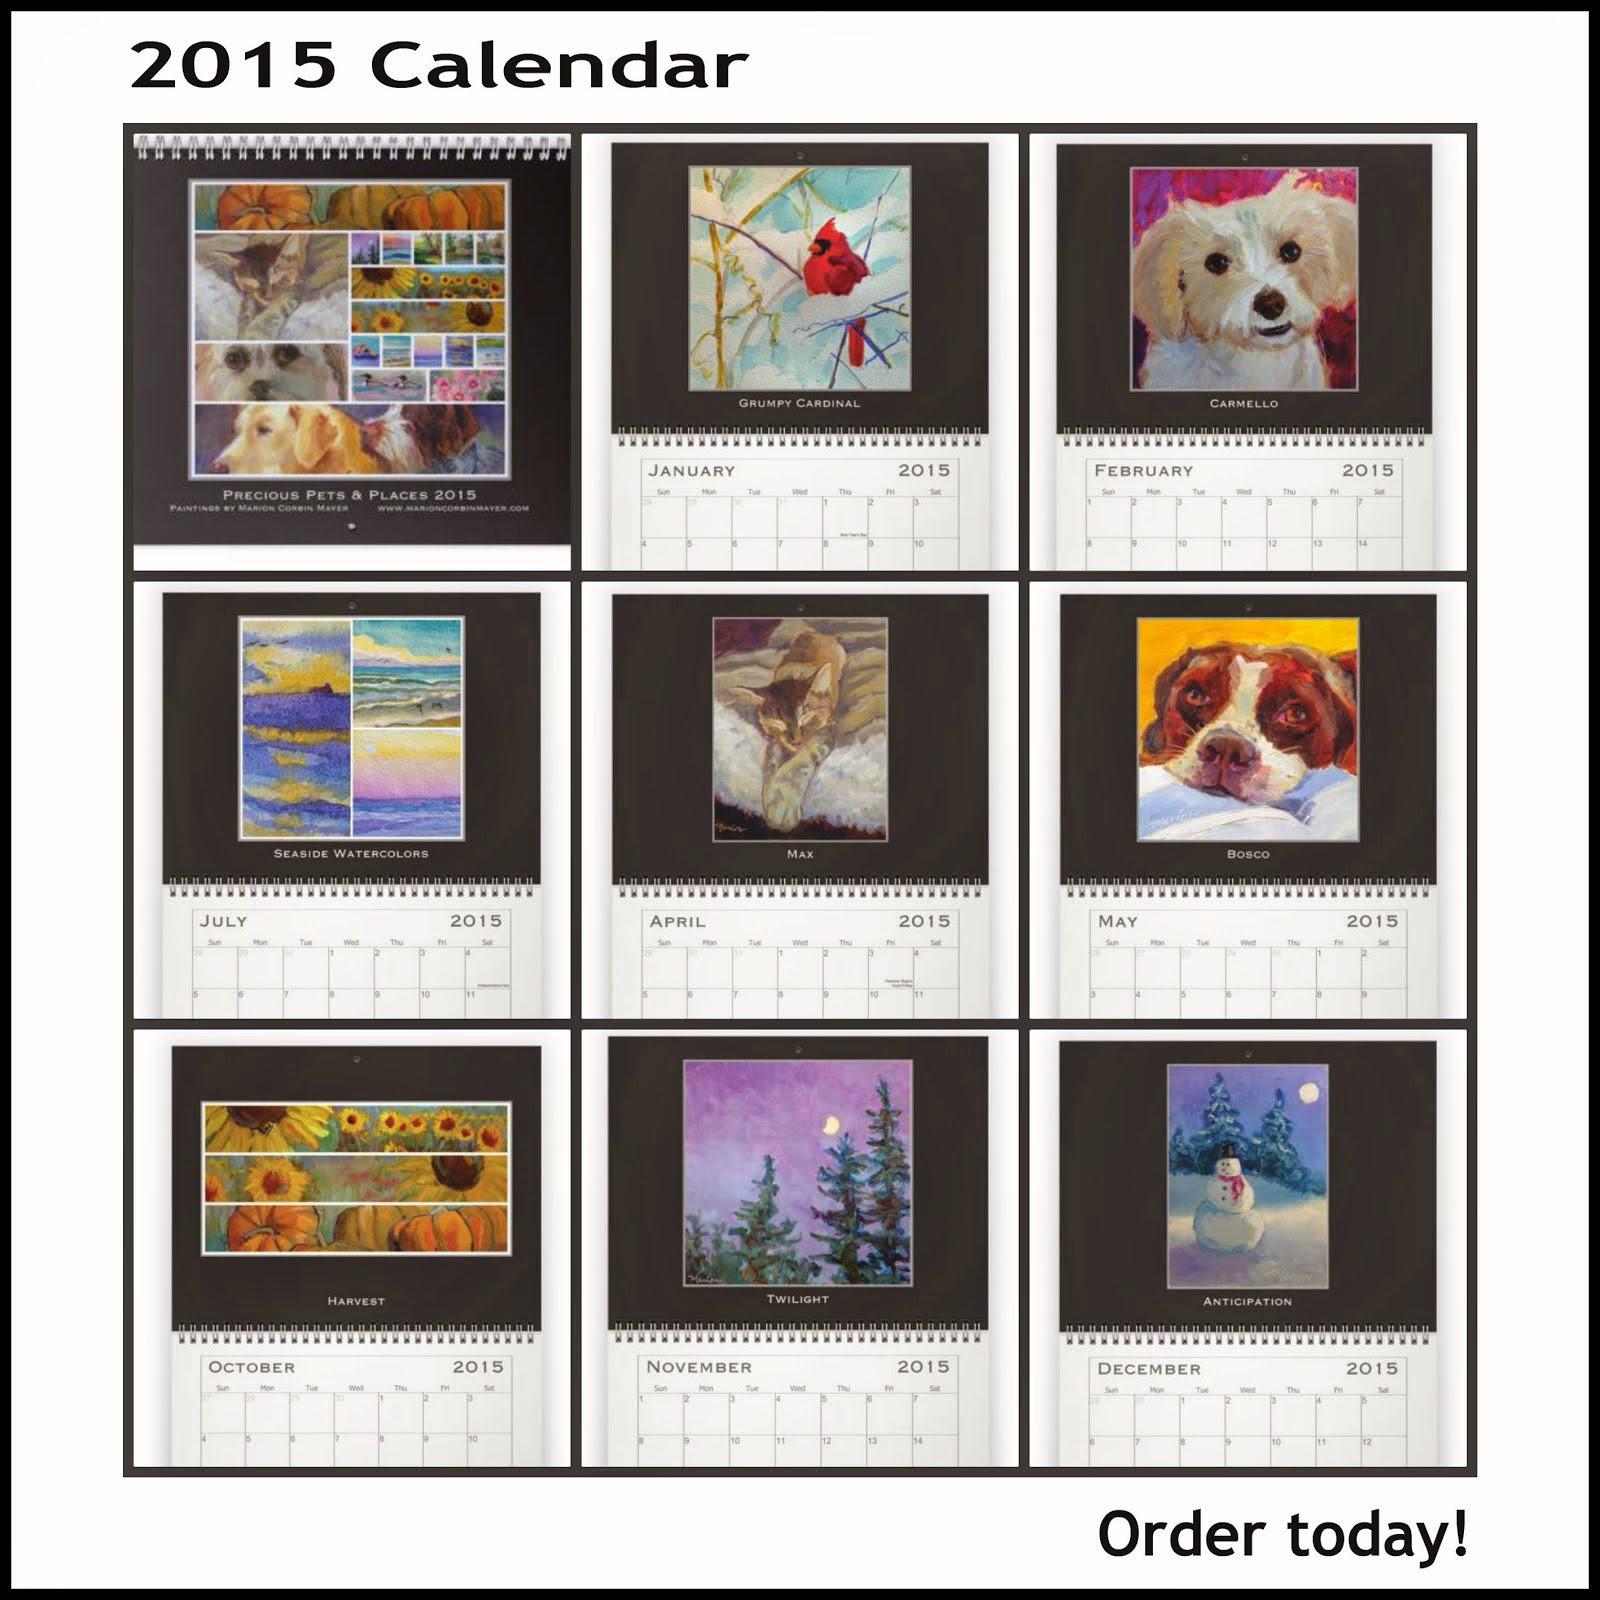 My 2015 Wall Calendar